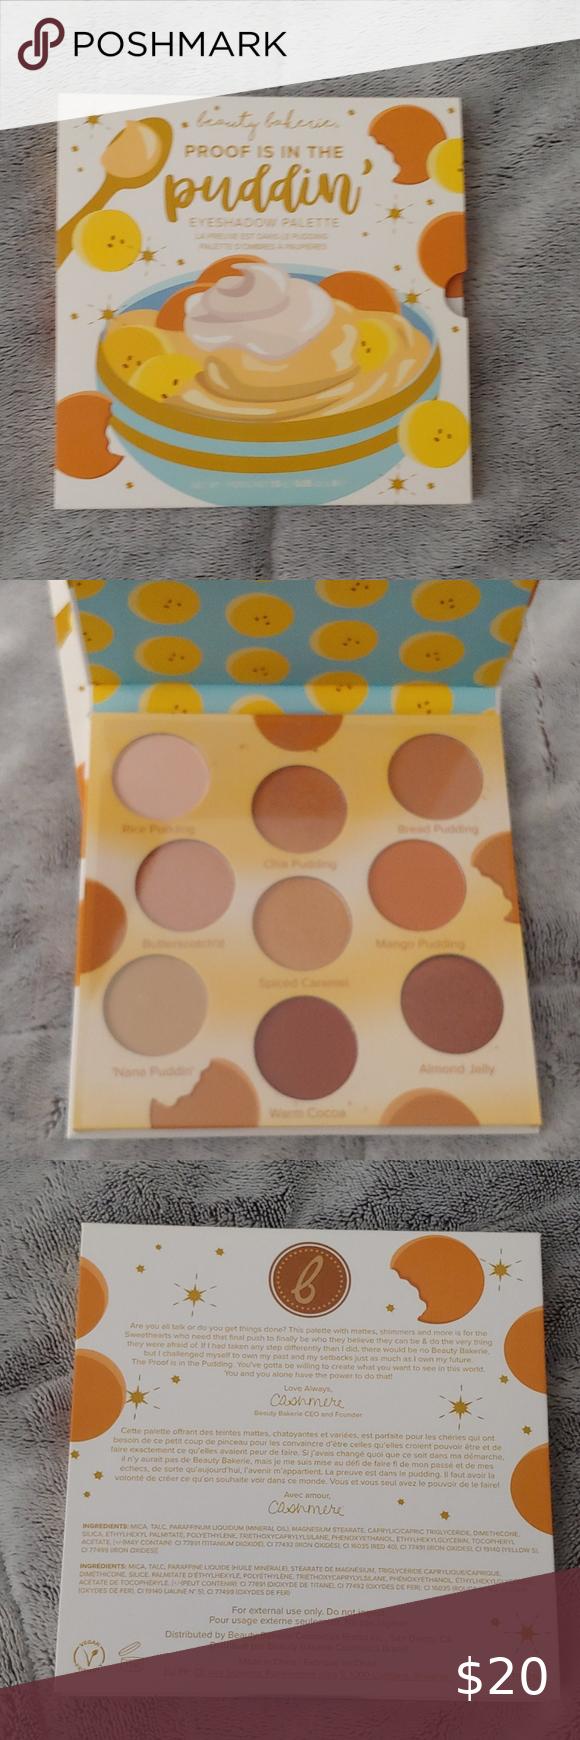 Eyeshadow palette in 2020 Eyeshadow palette, Eyeshadow